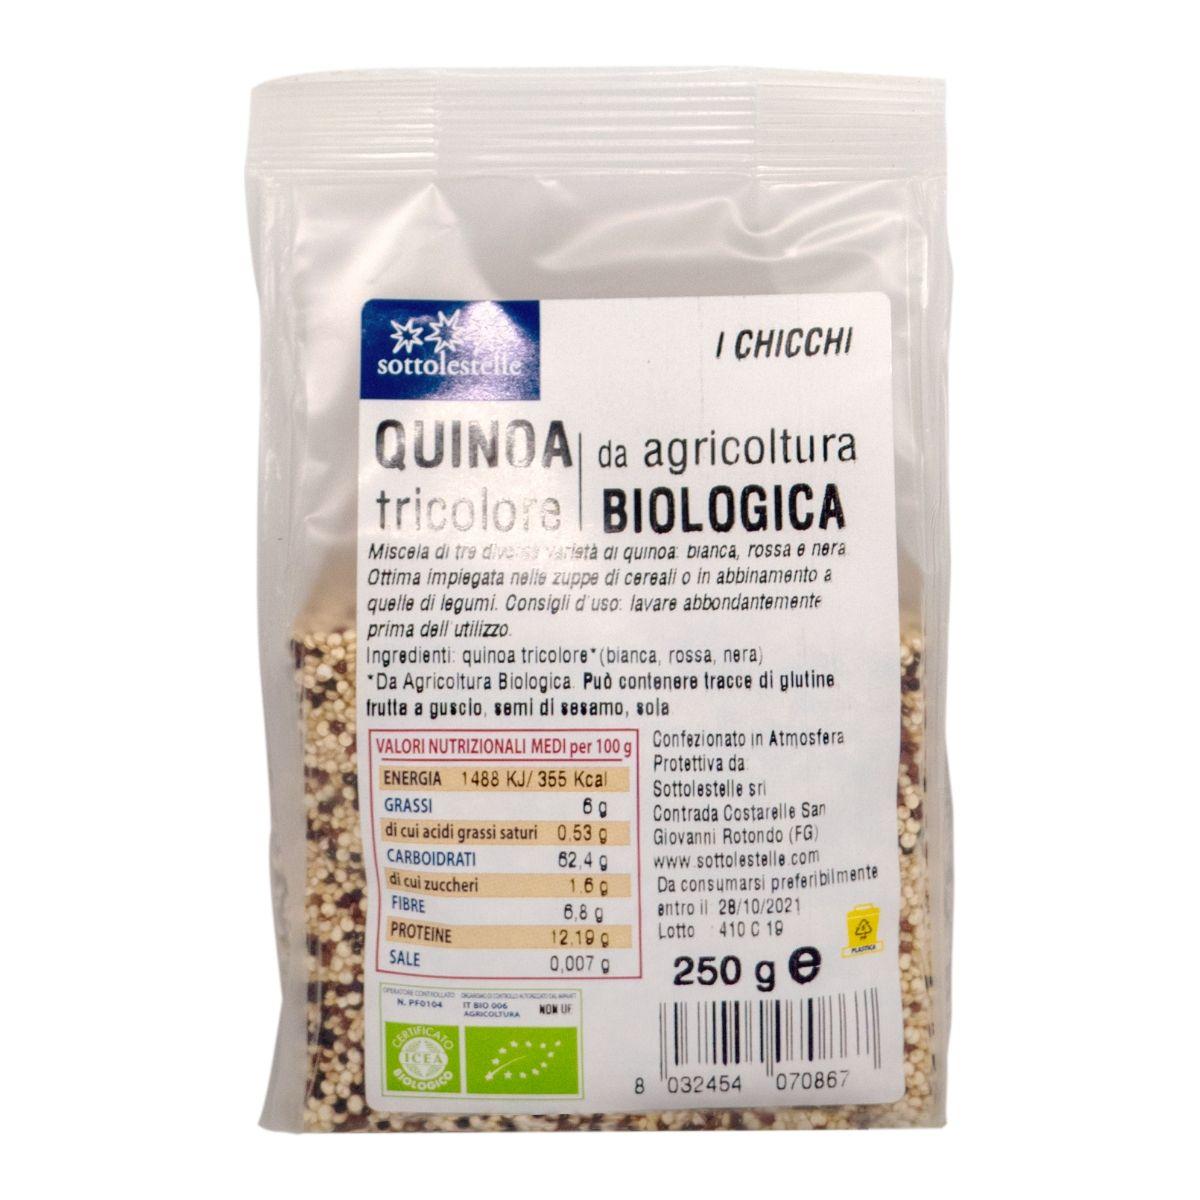 8032454070867 C Hạt diêm mạch hỗn hợp ba màu hữu cơ Sotto 250g - Quinoa Tricolore